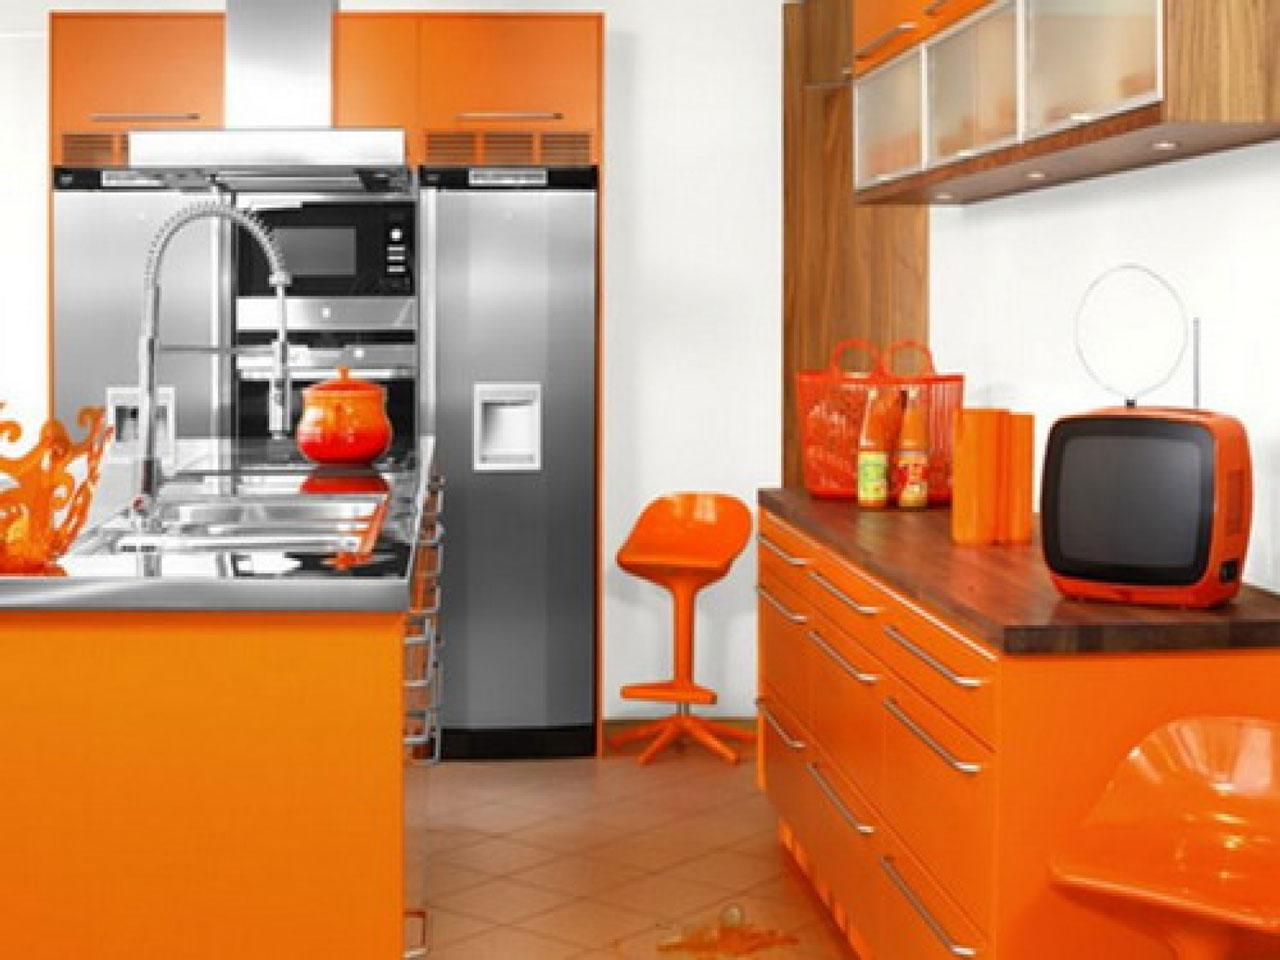 Amazing Orange Kitchen S Of Superbealing With Large Stand Floor Refrigator Furnished